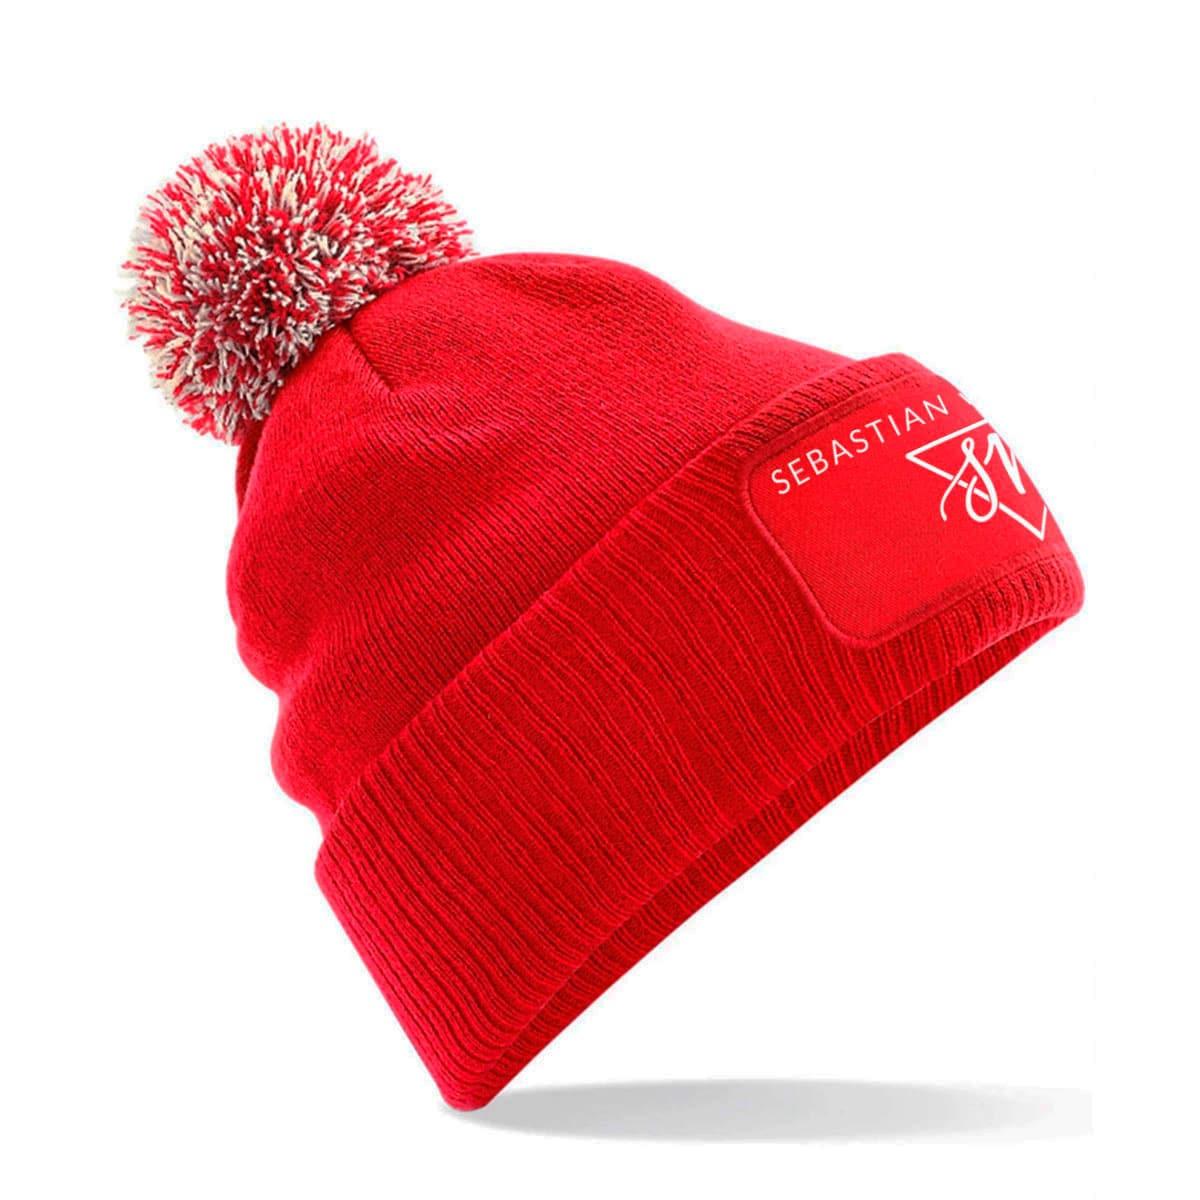 Sebastian von Mletzko mütze rot mit Bommel